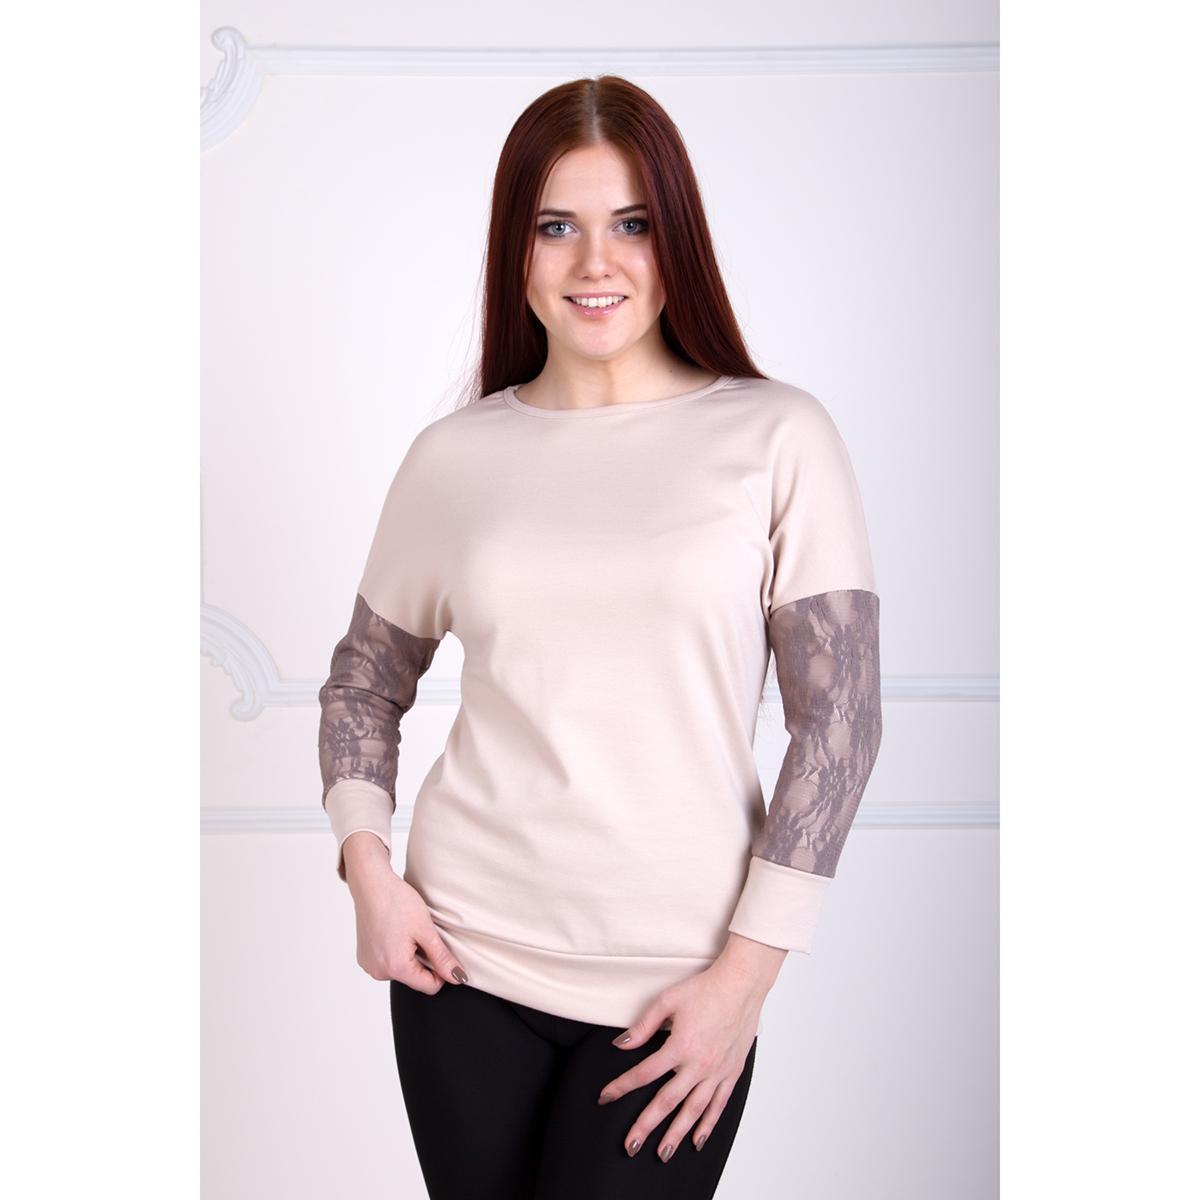 Женская блуза Лиана, размер 56Блузки, майки, кофты<br>Обхват груди:112 см<br>Обхват талии:92 см<br>Обхват бедер:120 см<br>Рост:167 см<br><br>Тип: Жен. блуза<br>Размер: 56<br>Материал: Милано